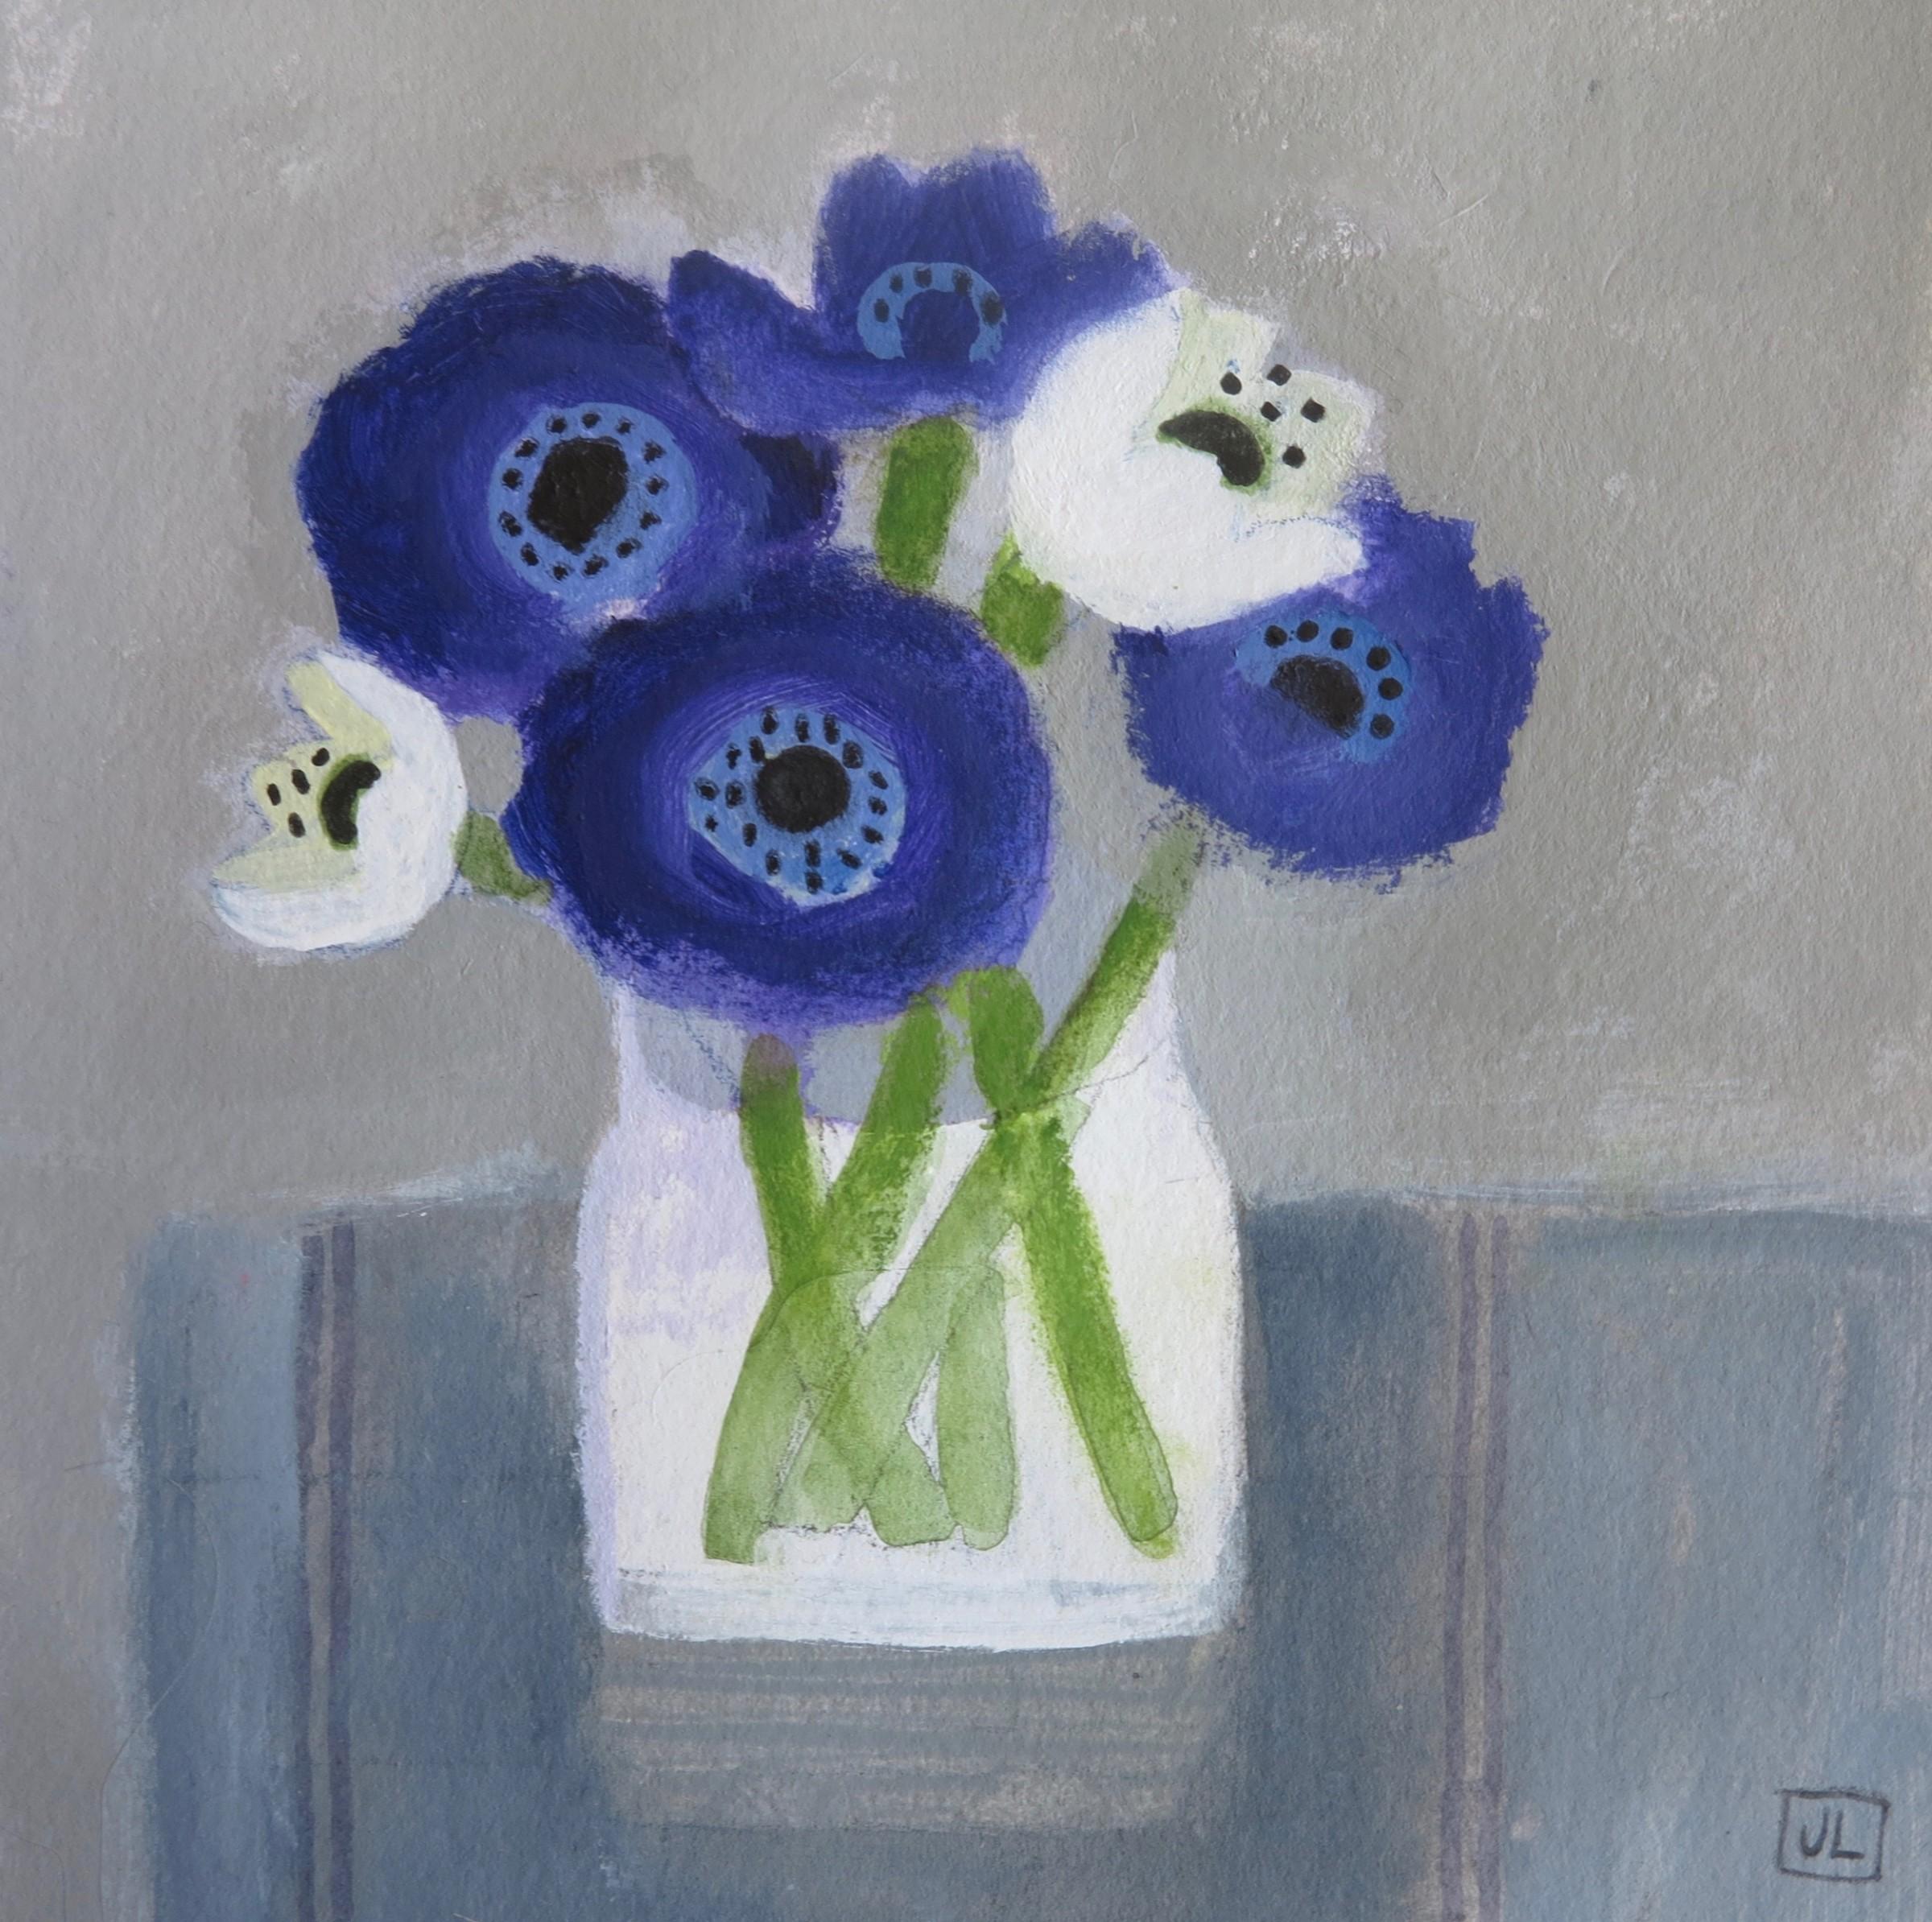 <span class=&#34;link fancybox-details-link&#34;><a href=&#34;/exhibitions/24/works/artworks_standalone10725/&#34;>View Detail Page</a></span><div class=&#34;artist&#34;><span class=&#34;artist&#34;><strong>Jill Leman</strong></span></div><div class=&#34;title&#34;><em>Anemones from St Ives</em></div><div class=&#34;medium&#34;>watercolour & acrylic</div><div class=&#34;dimensions&#34;>32.5x32cm</div>